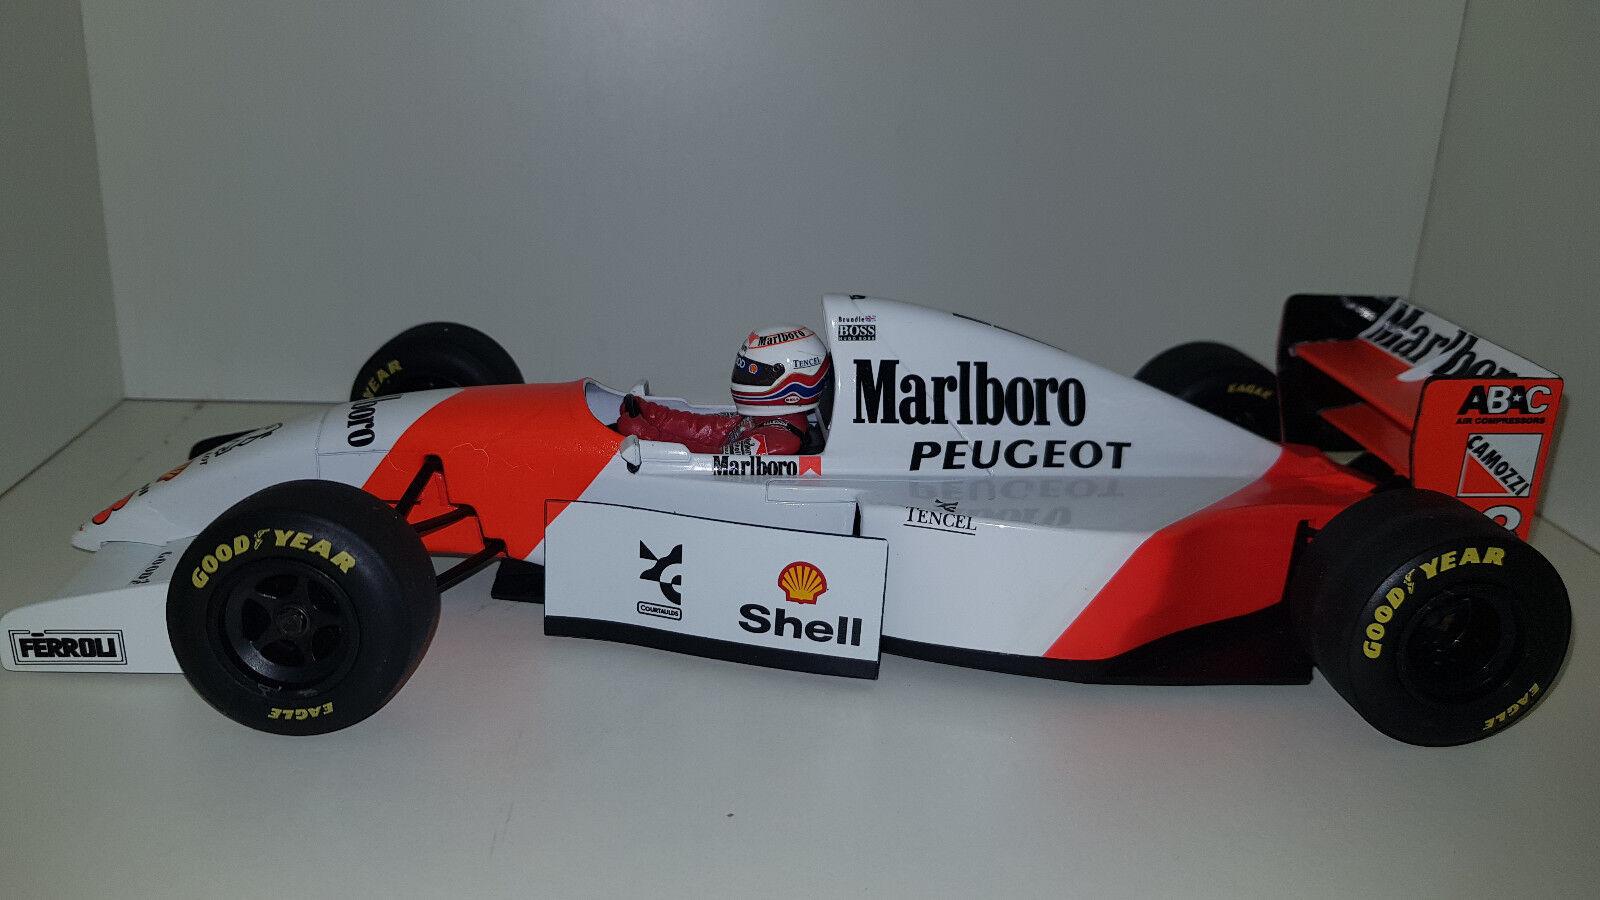 economico online Minichamps 1 18 McLaren PEUGEOT MP4 9 M. M. M. Bcorreredle 1994 MARLBoro livrea 530941808  omaggi allo stadio